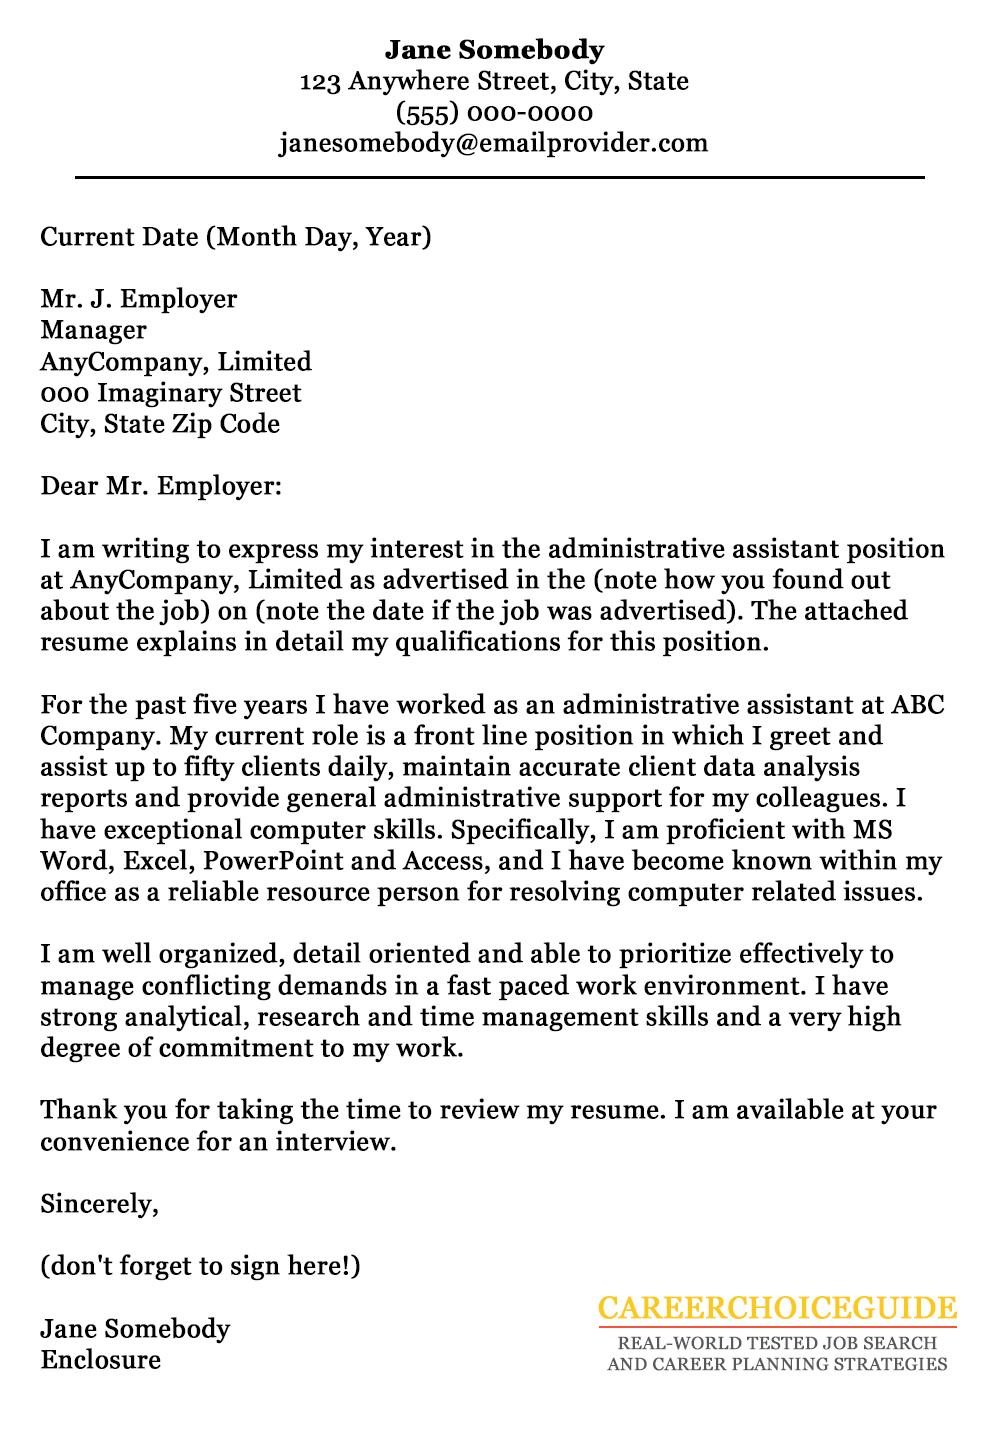 Application letter for school enrollment